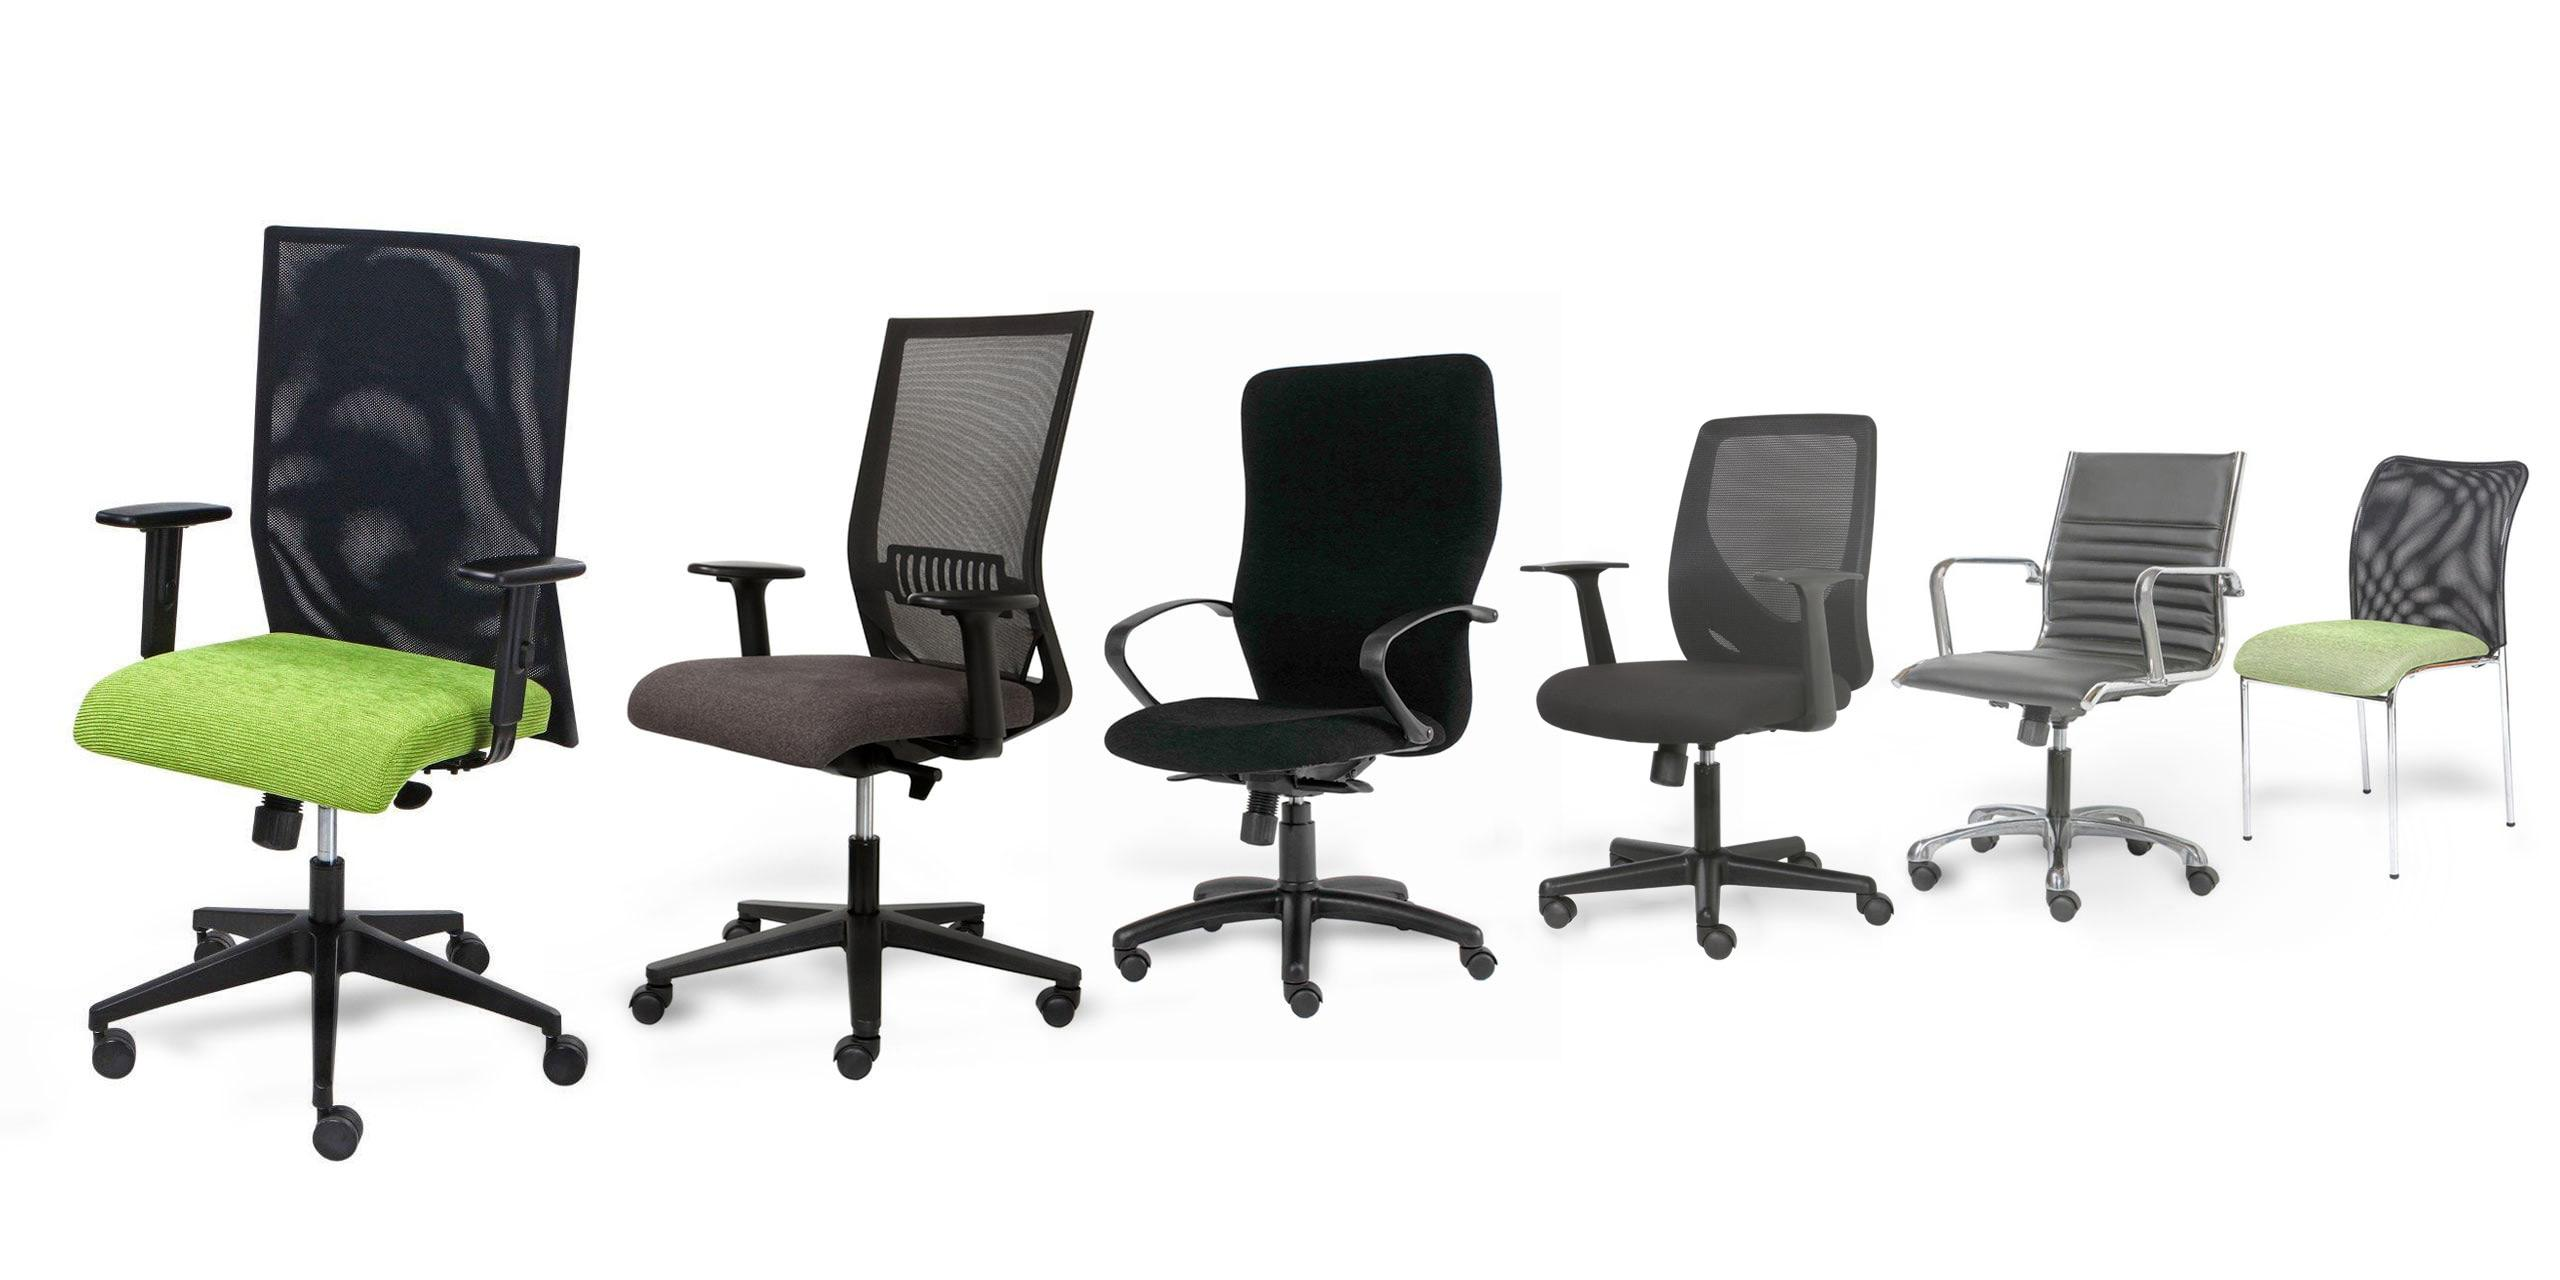 K-mark chairs